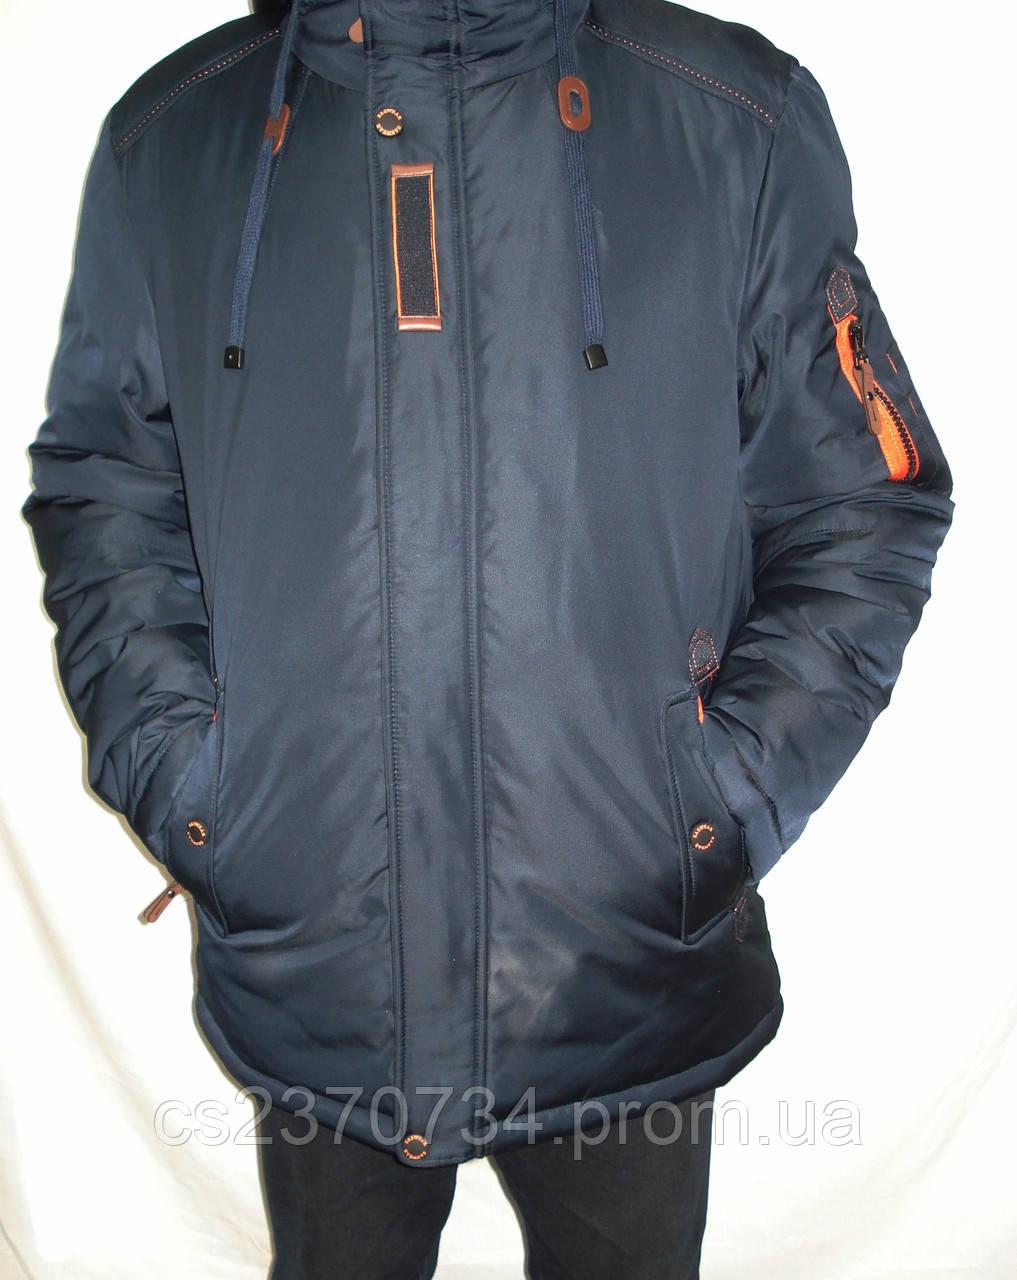 Куртка мужская зимняя SAZ (..52.56,58)